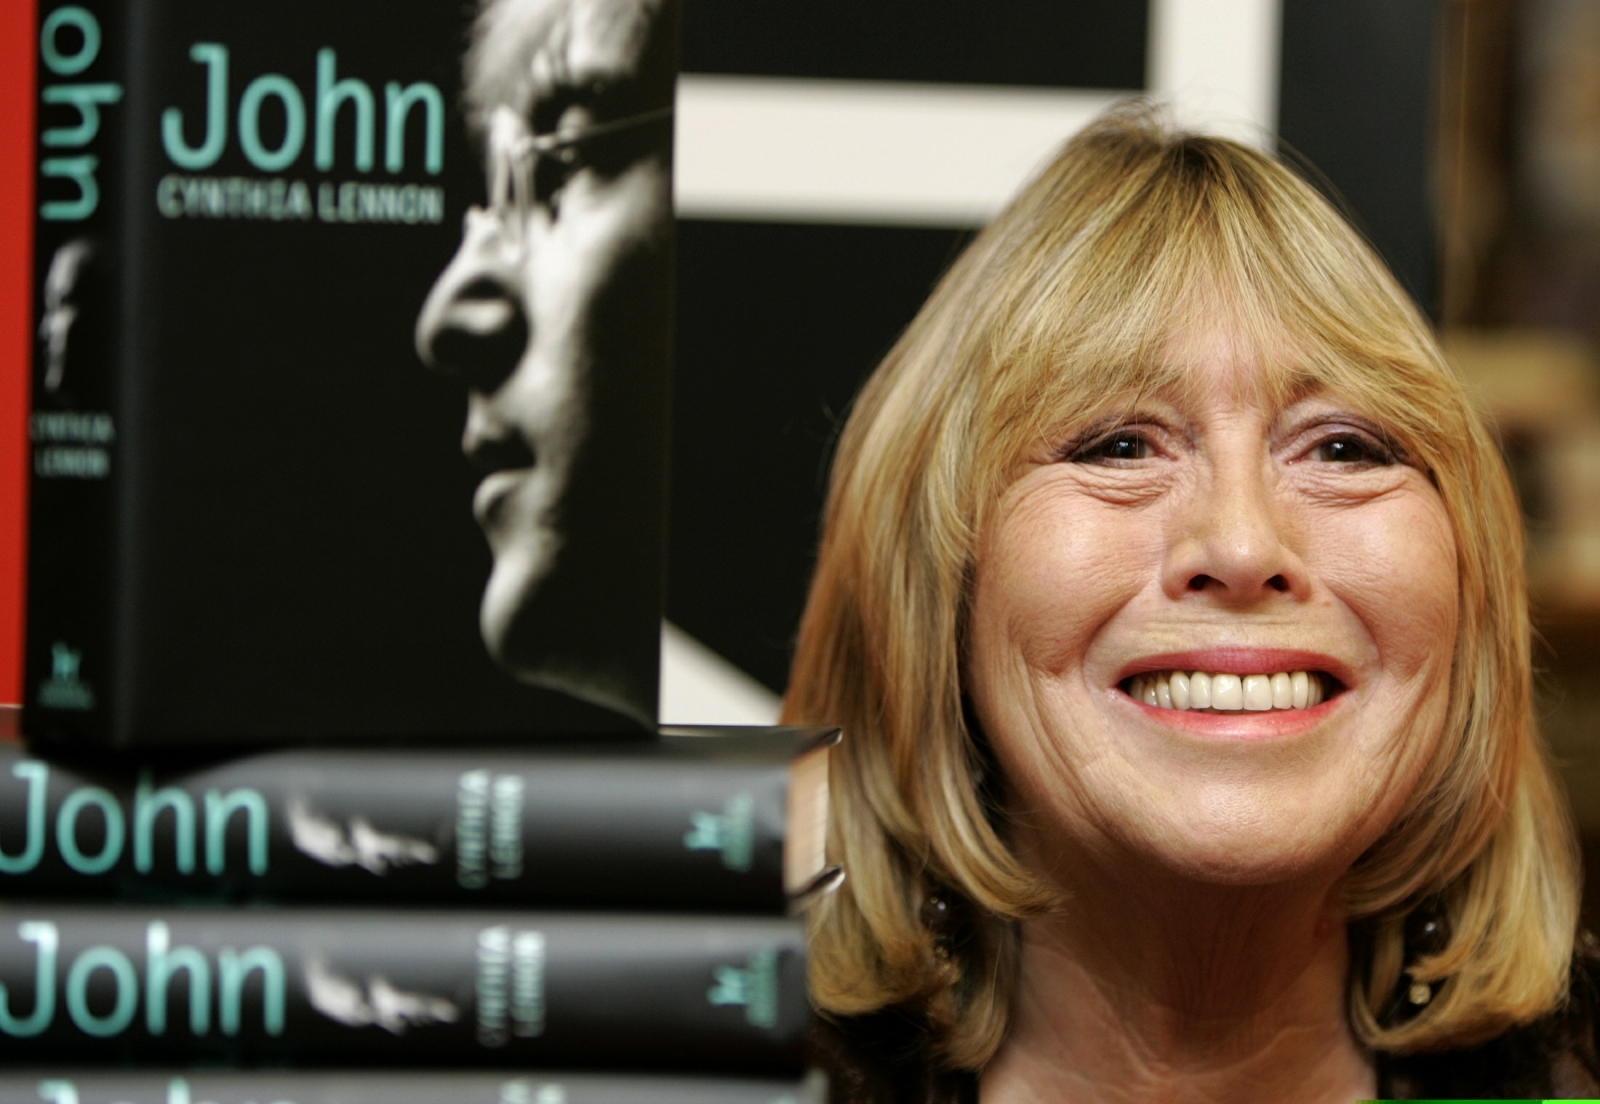 Cynthia Lennon at book launch